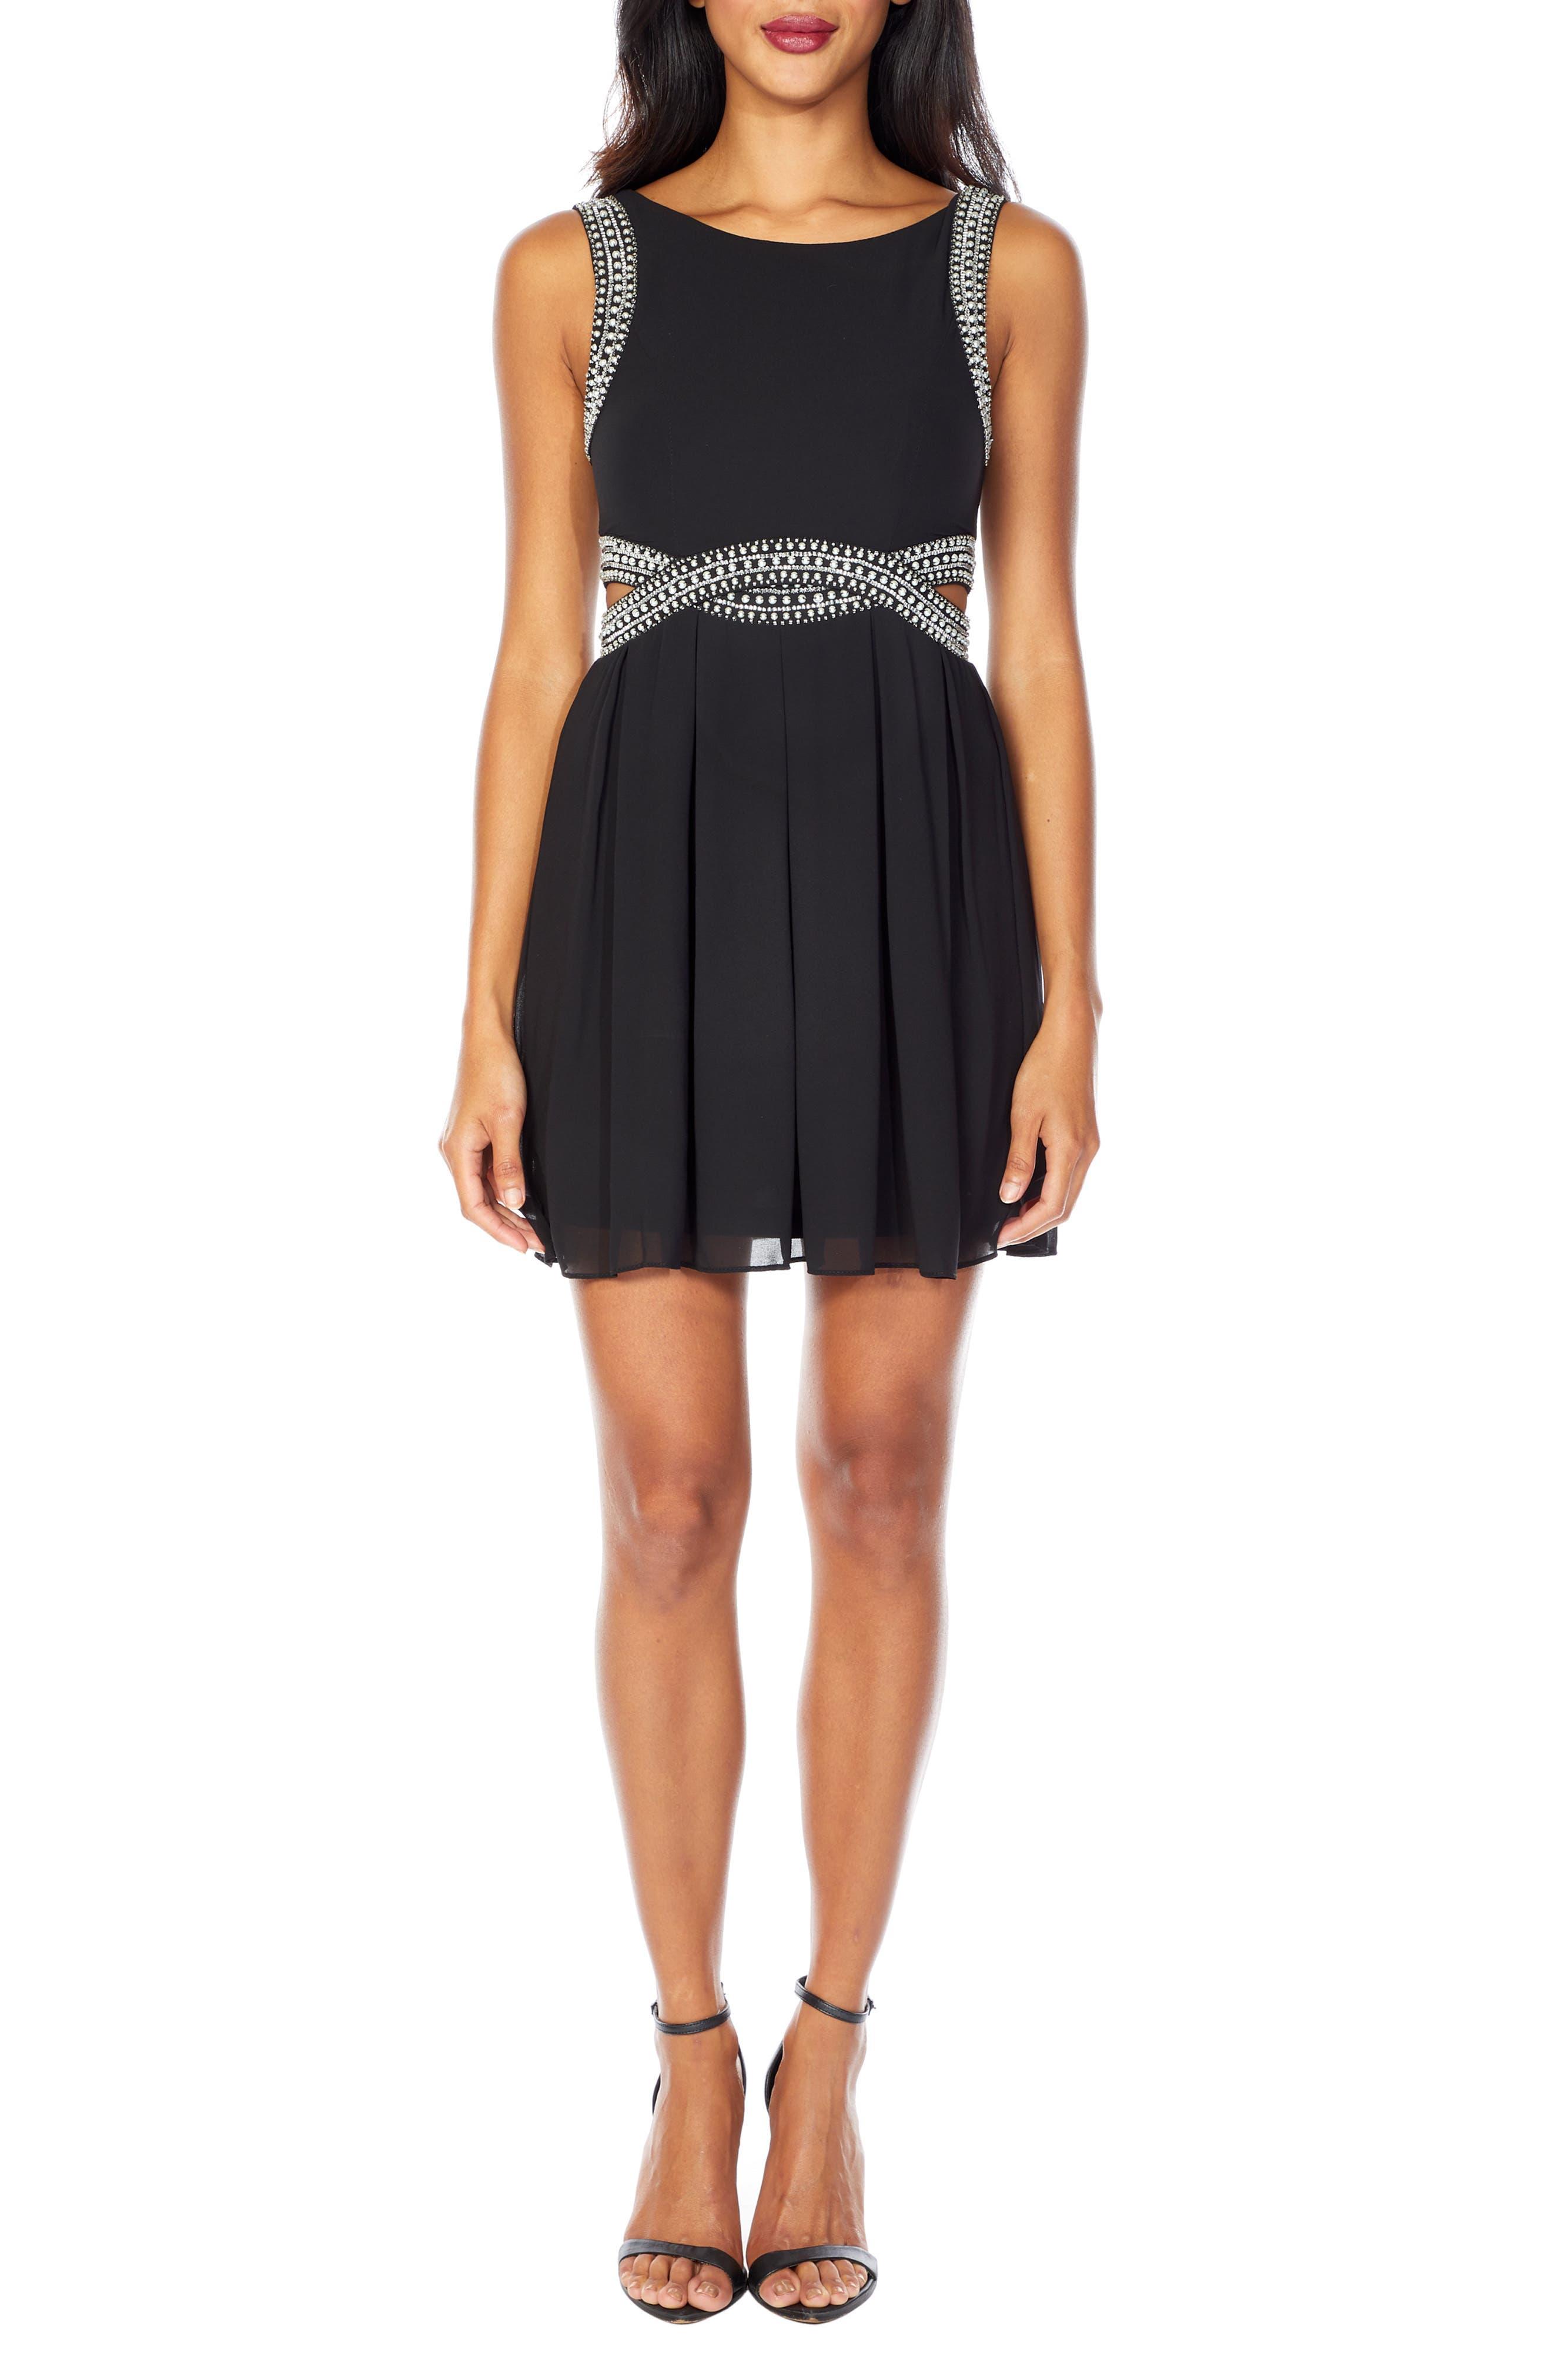 Malaga Beaded Minidress,                             Main thumbnail 1, color,                             BLACK